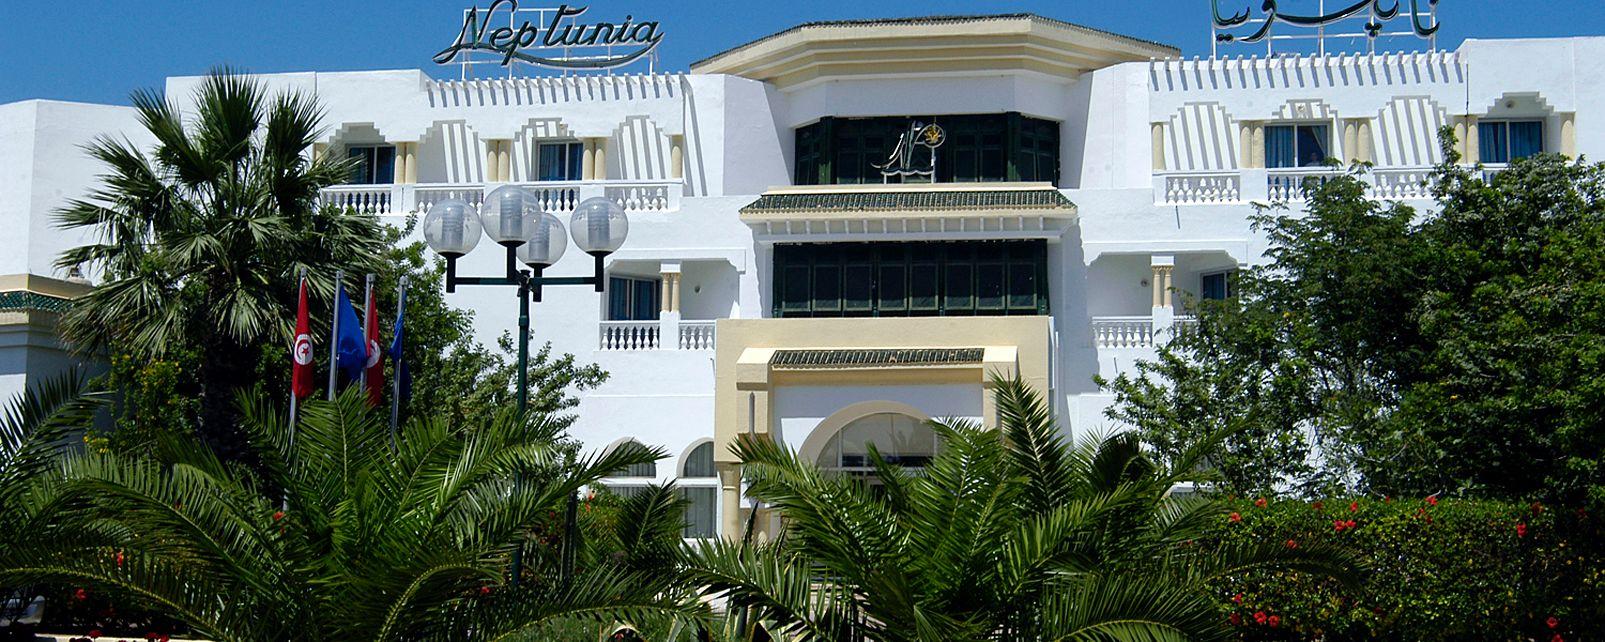 Hôtel Neptunia Beach